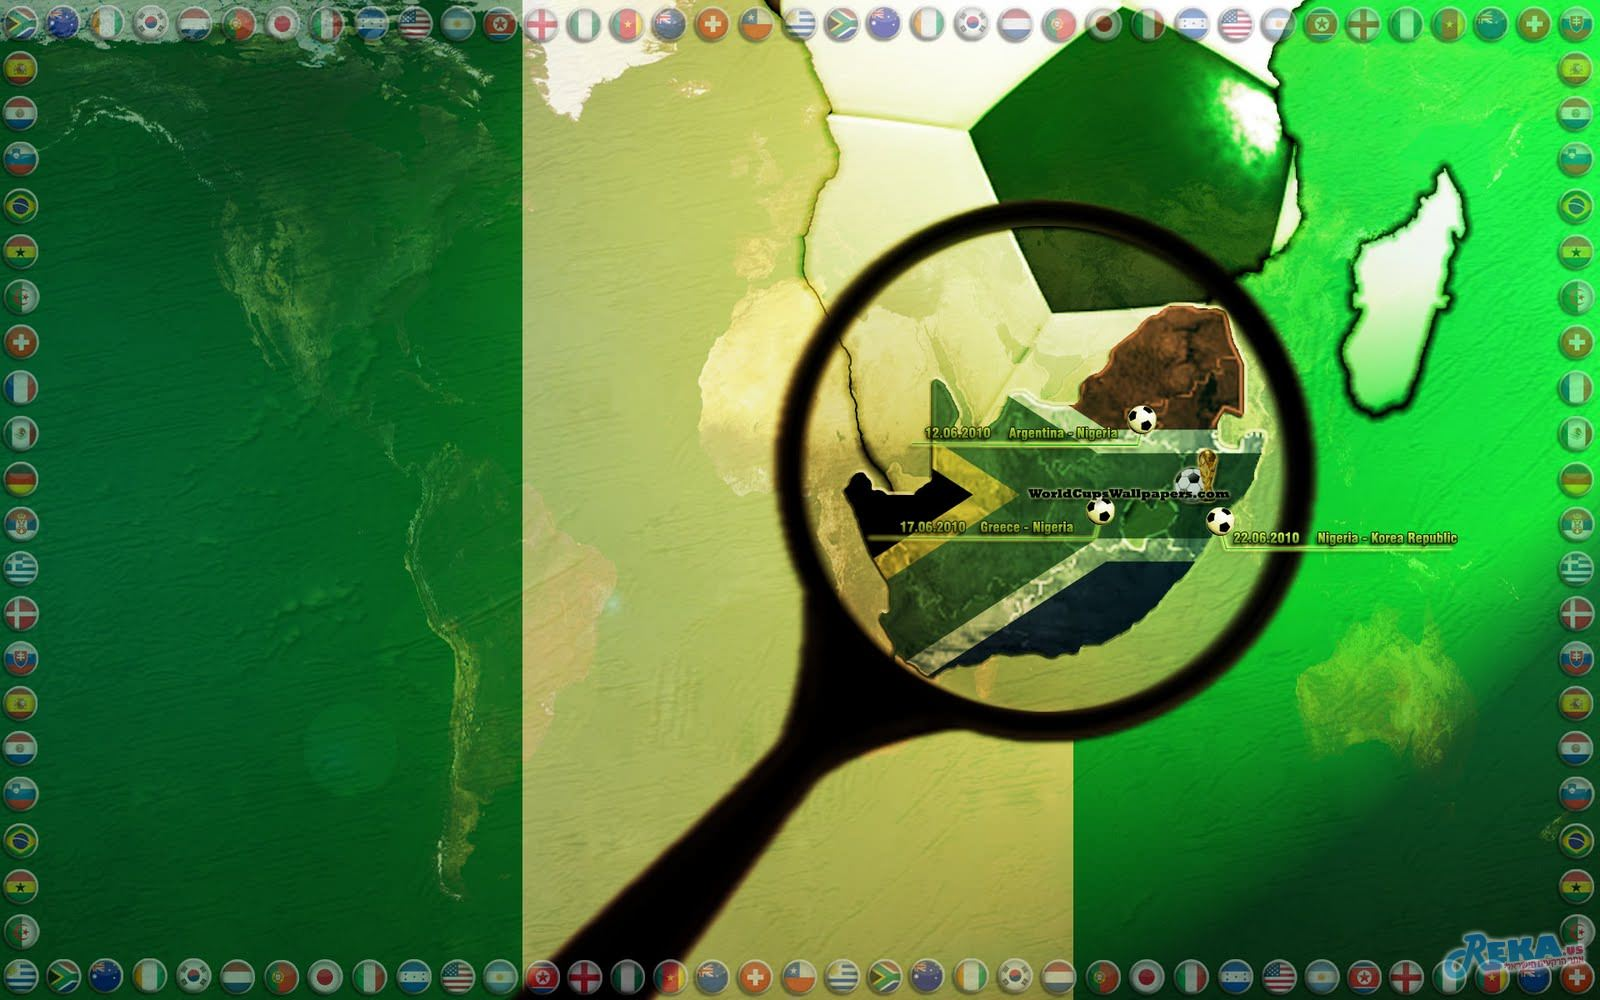 Nigeria-World-Cup-2010-Widescreen-Wallpaper